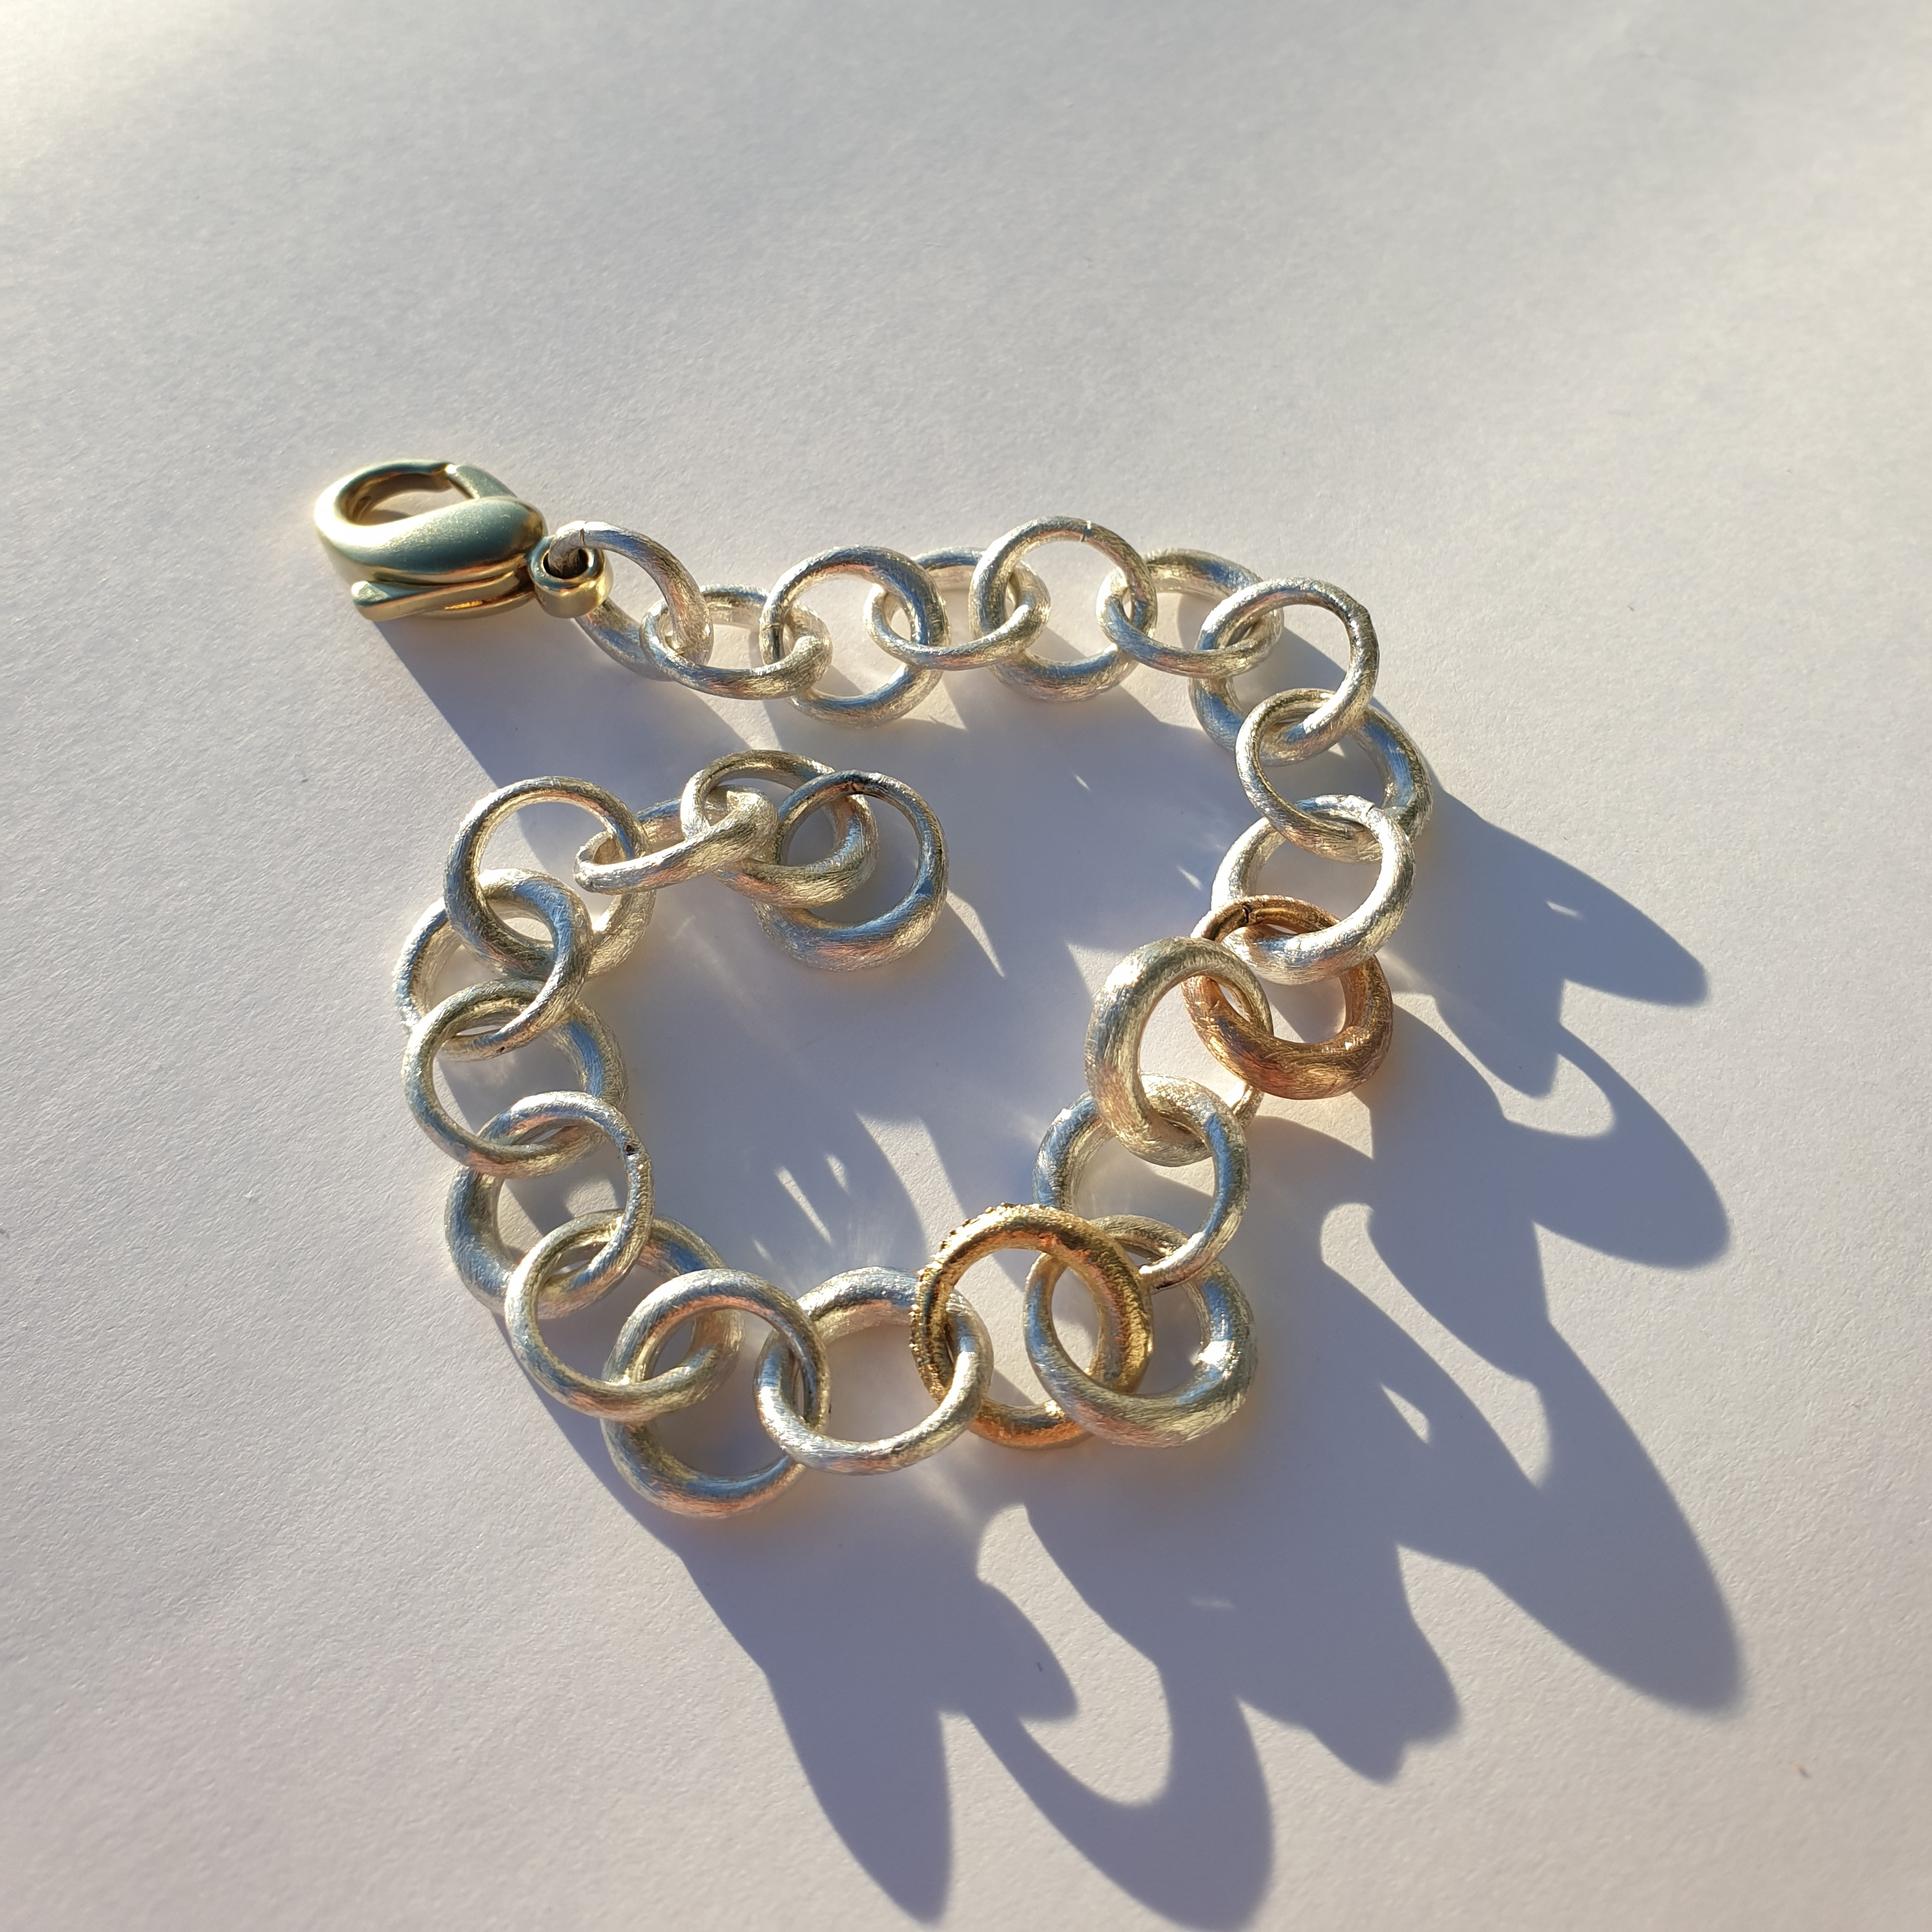 Samhald armband Ring 1